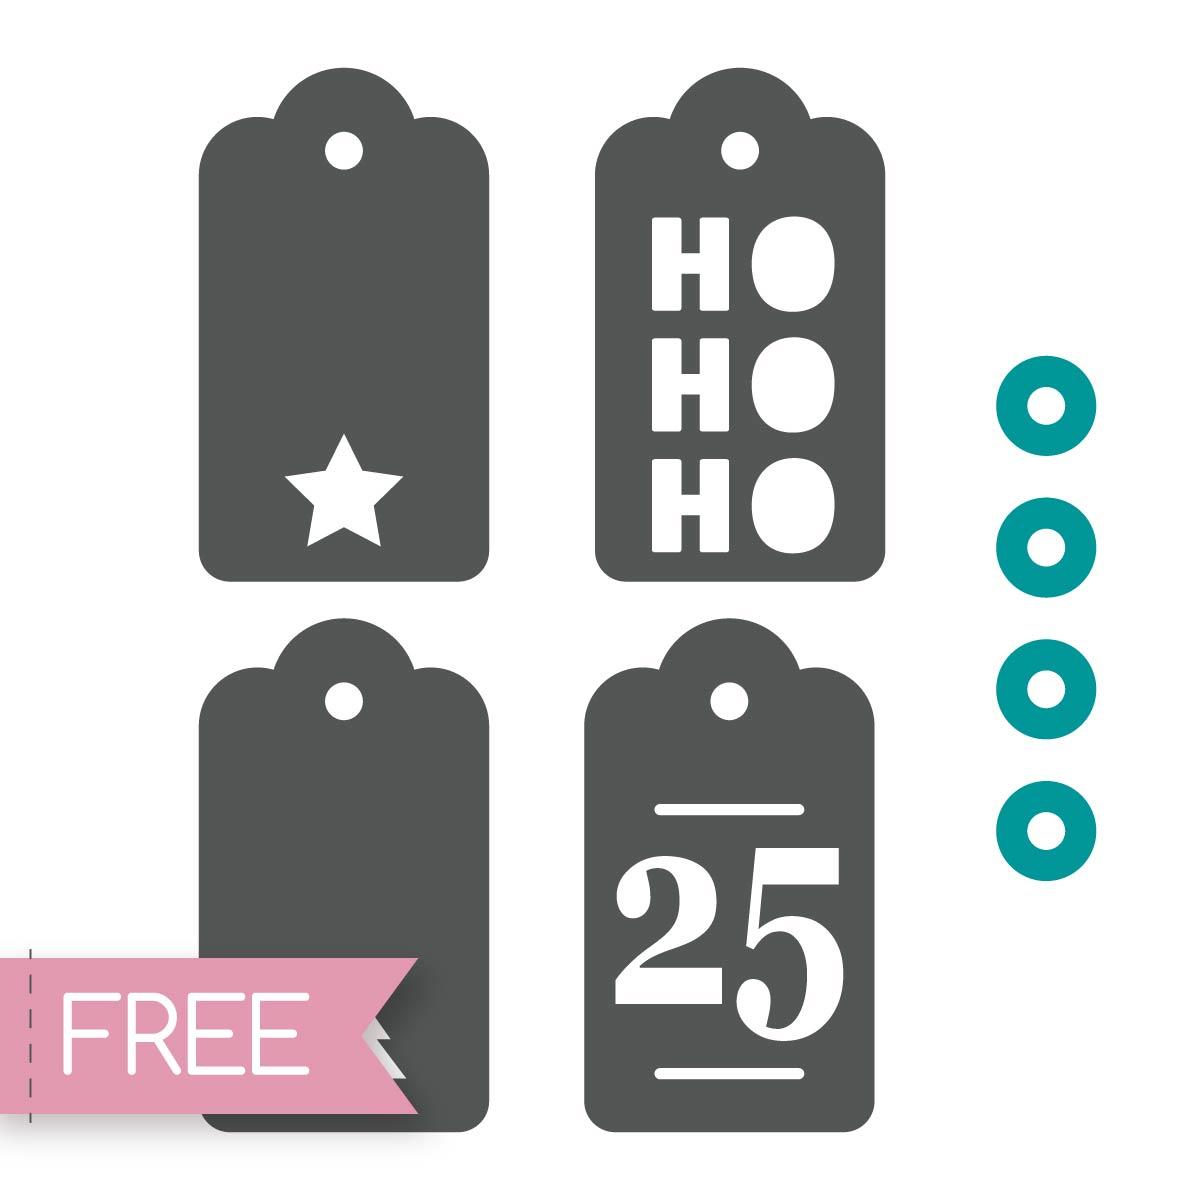 Free Cricut SVG gift tags